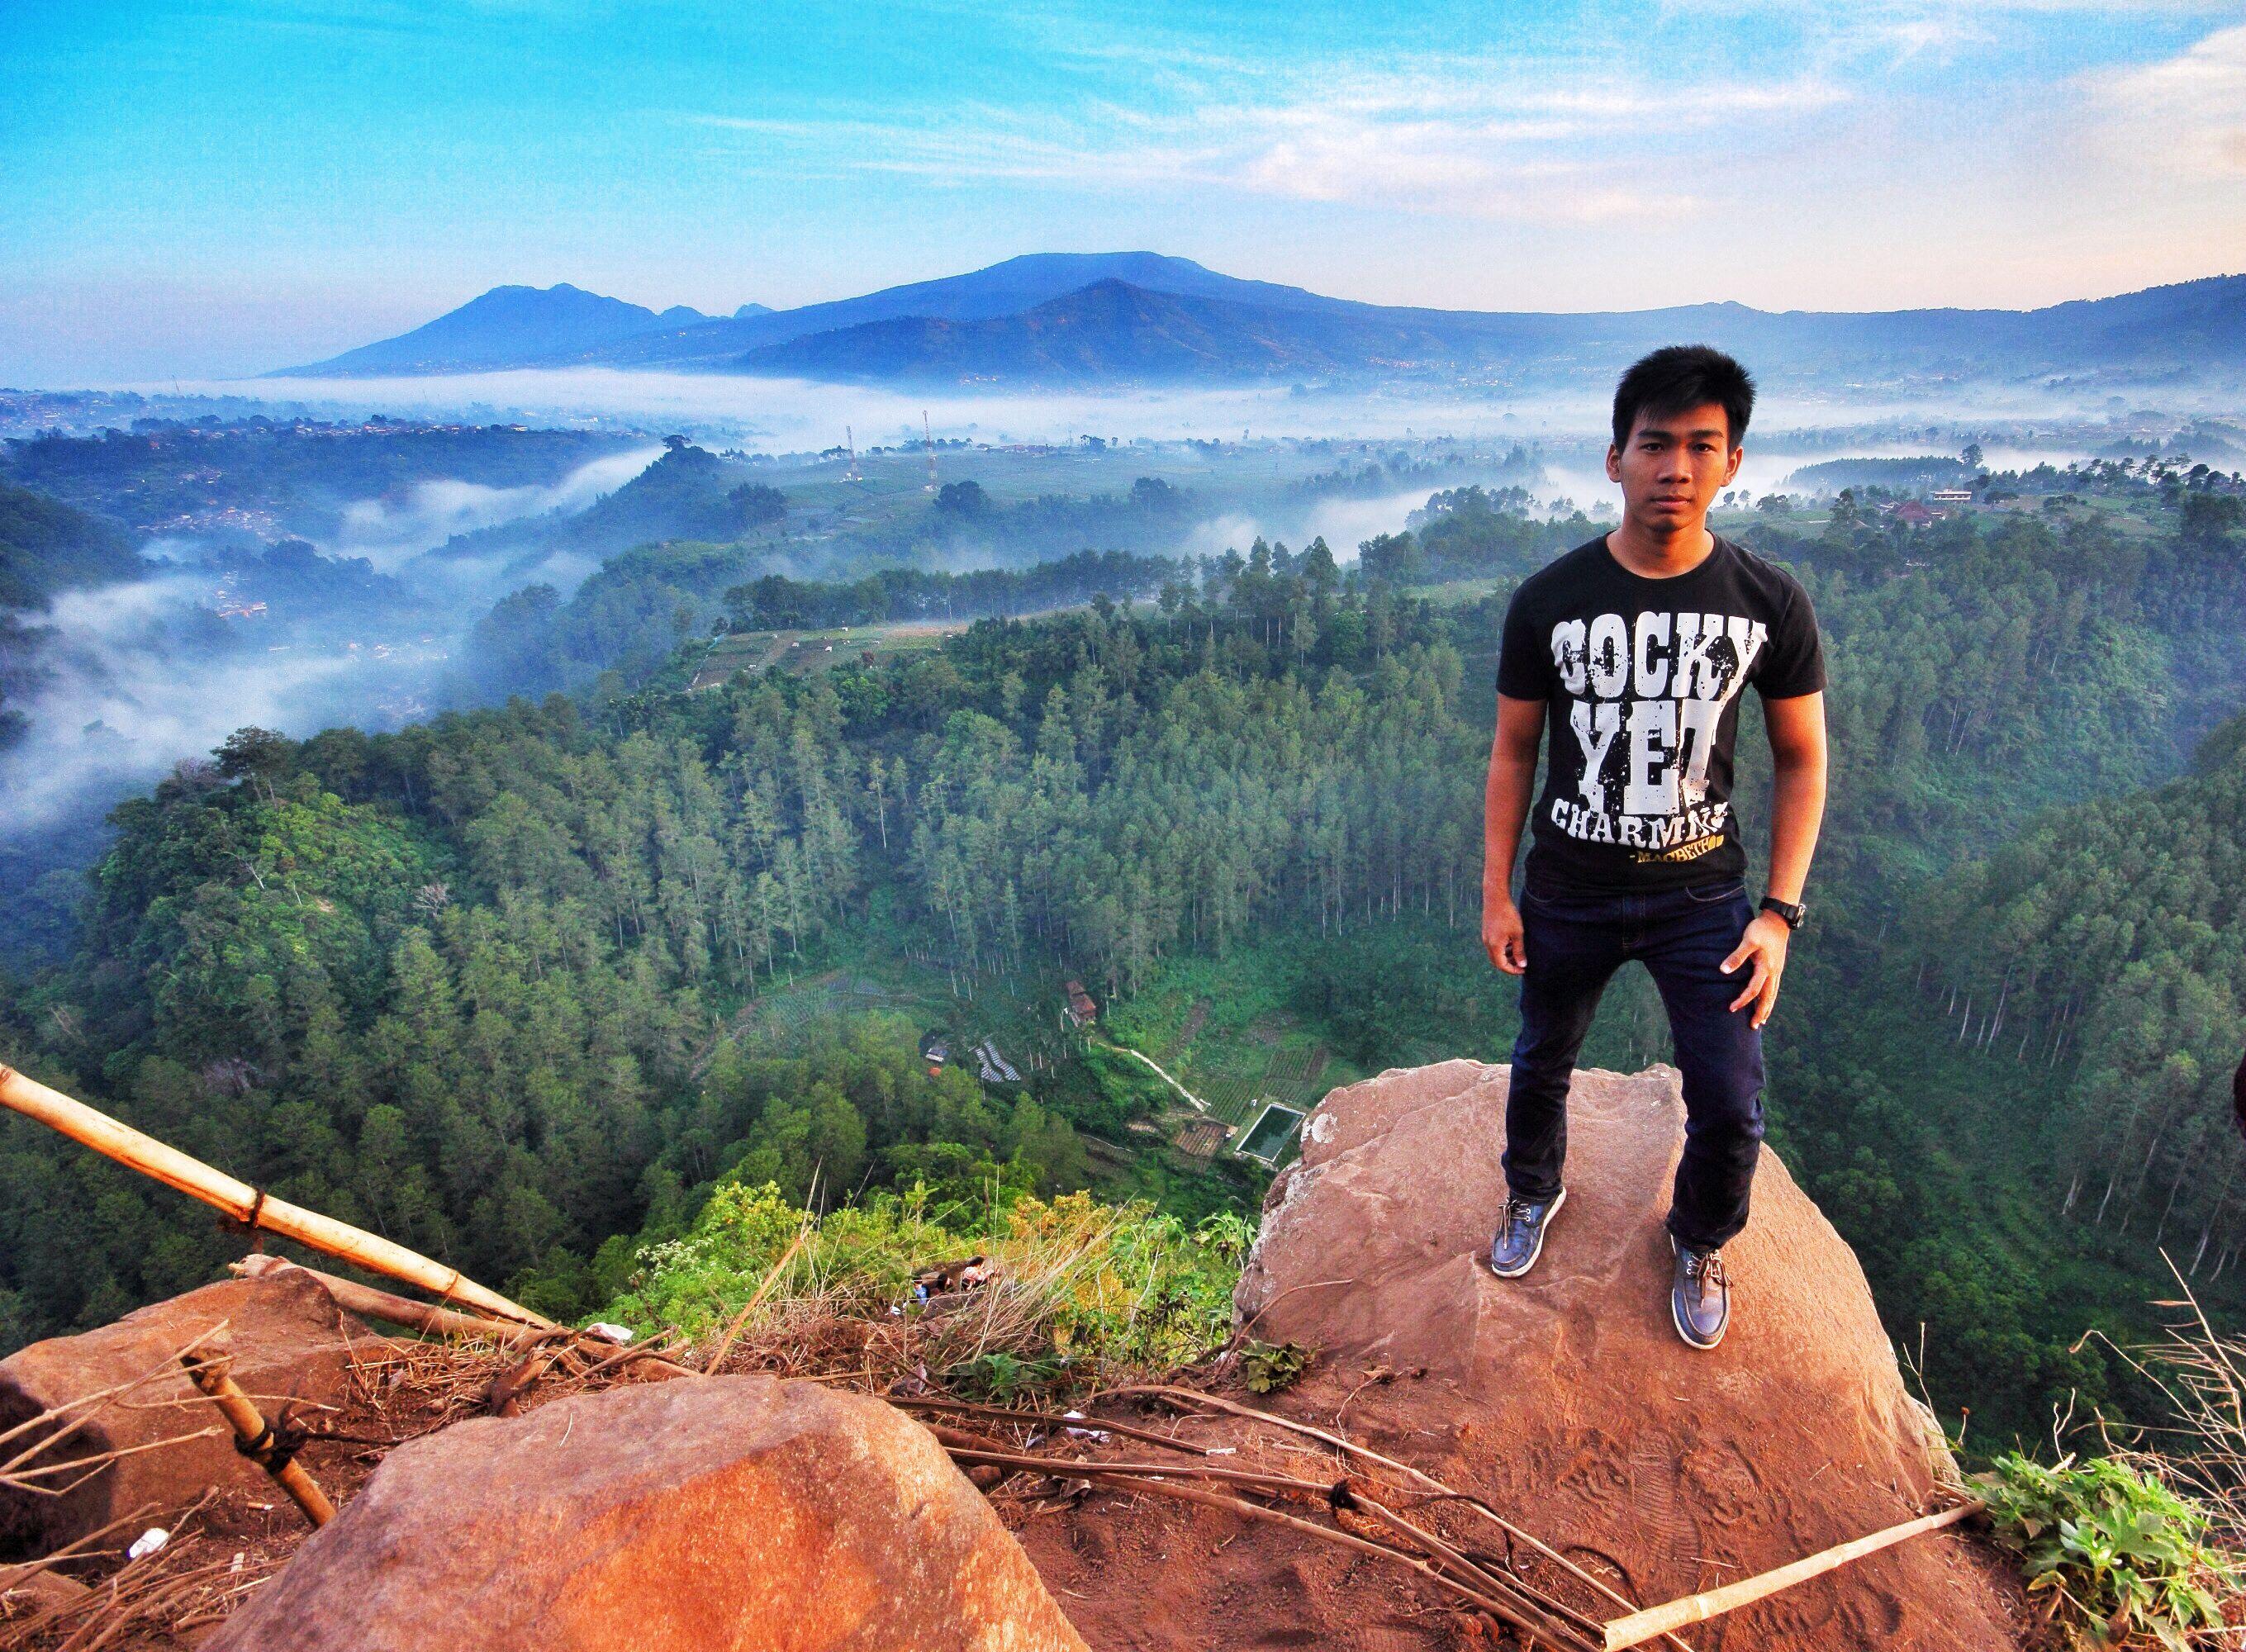 Tebing Keraton Bandung West Java Indonesia Tebingkeraton Jawabarat Taman Nuart